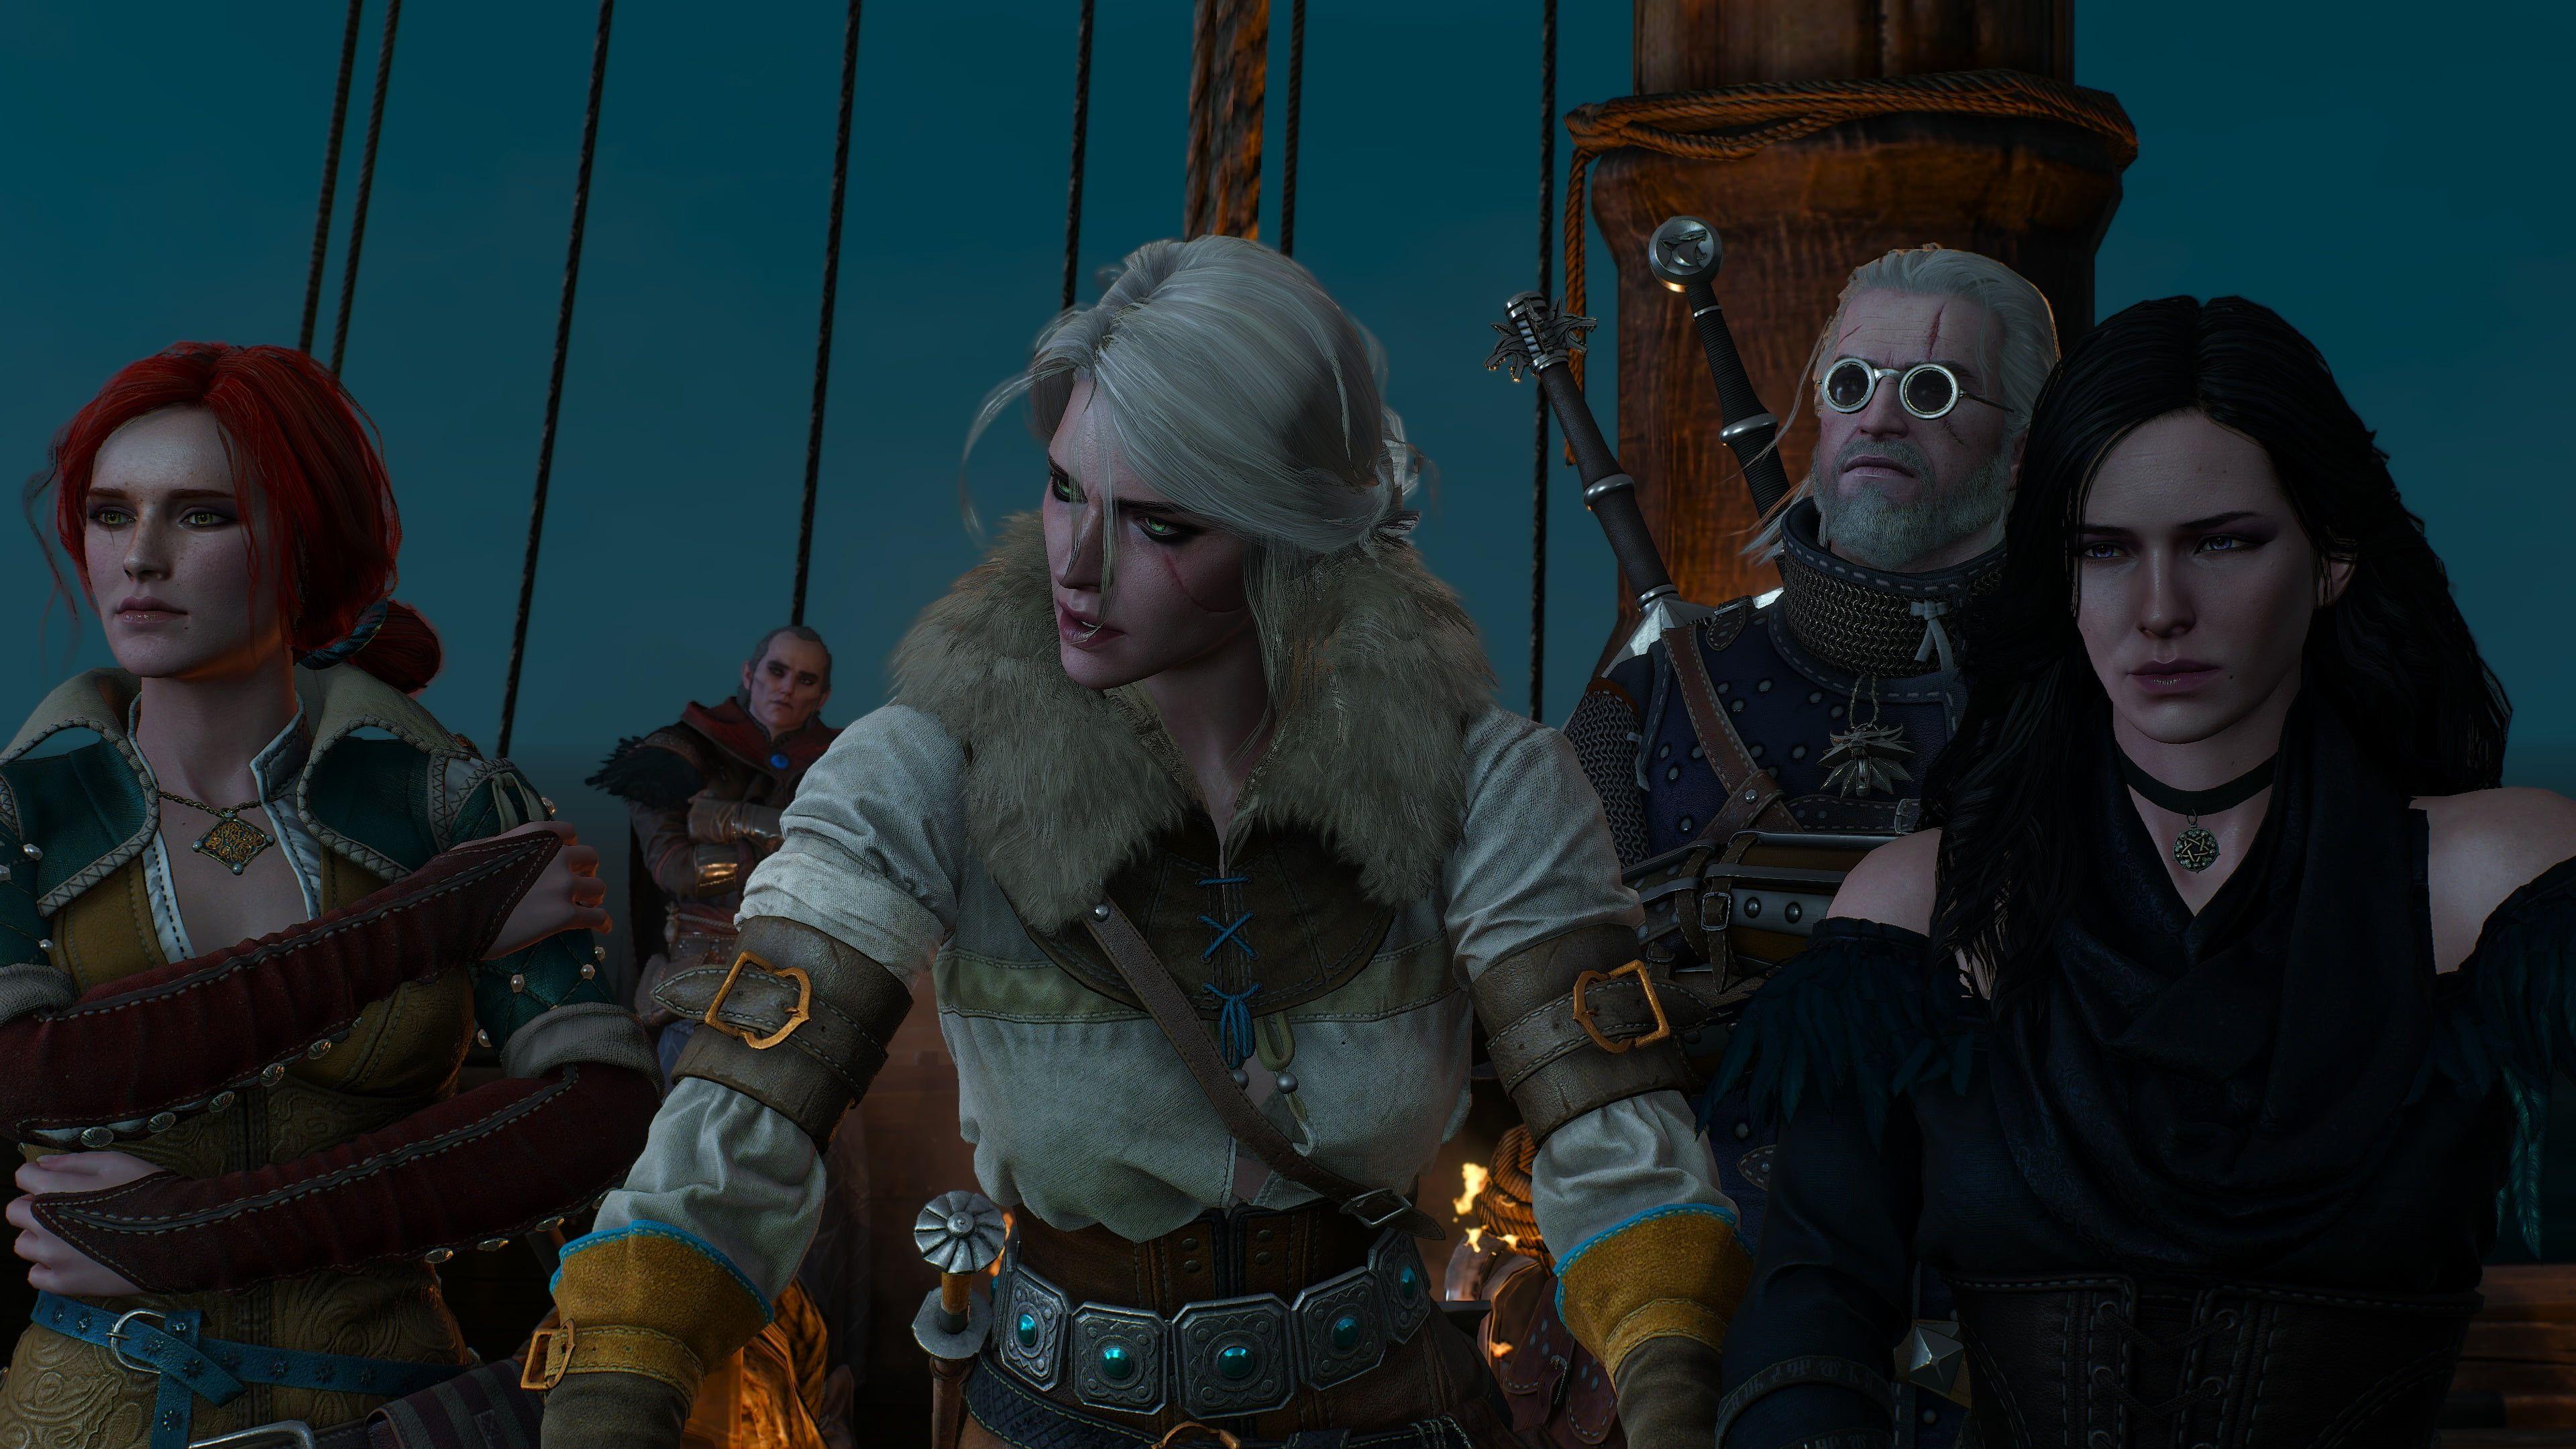 The Witcher The Witcher 3 Wild Hunt 4k Geralt Of Rivia Ciri